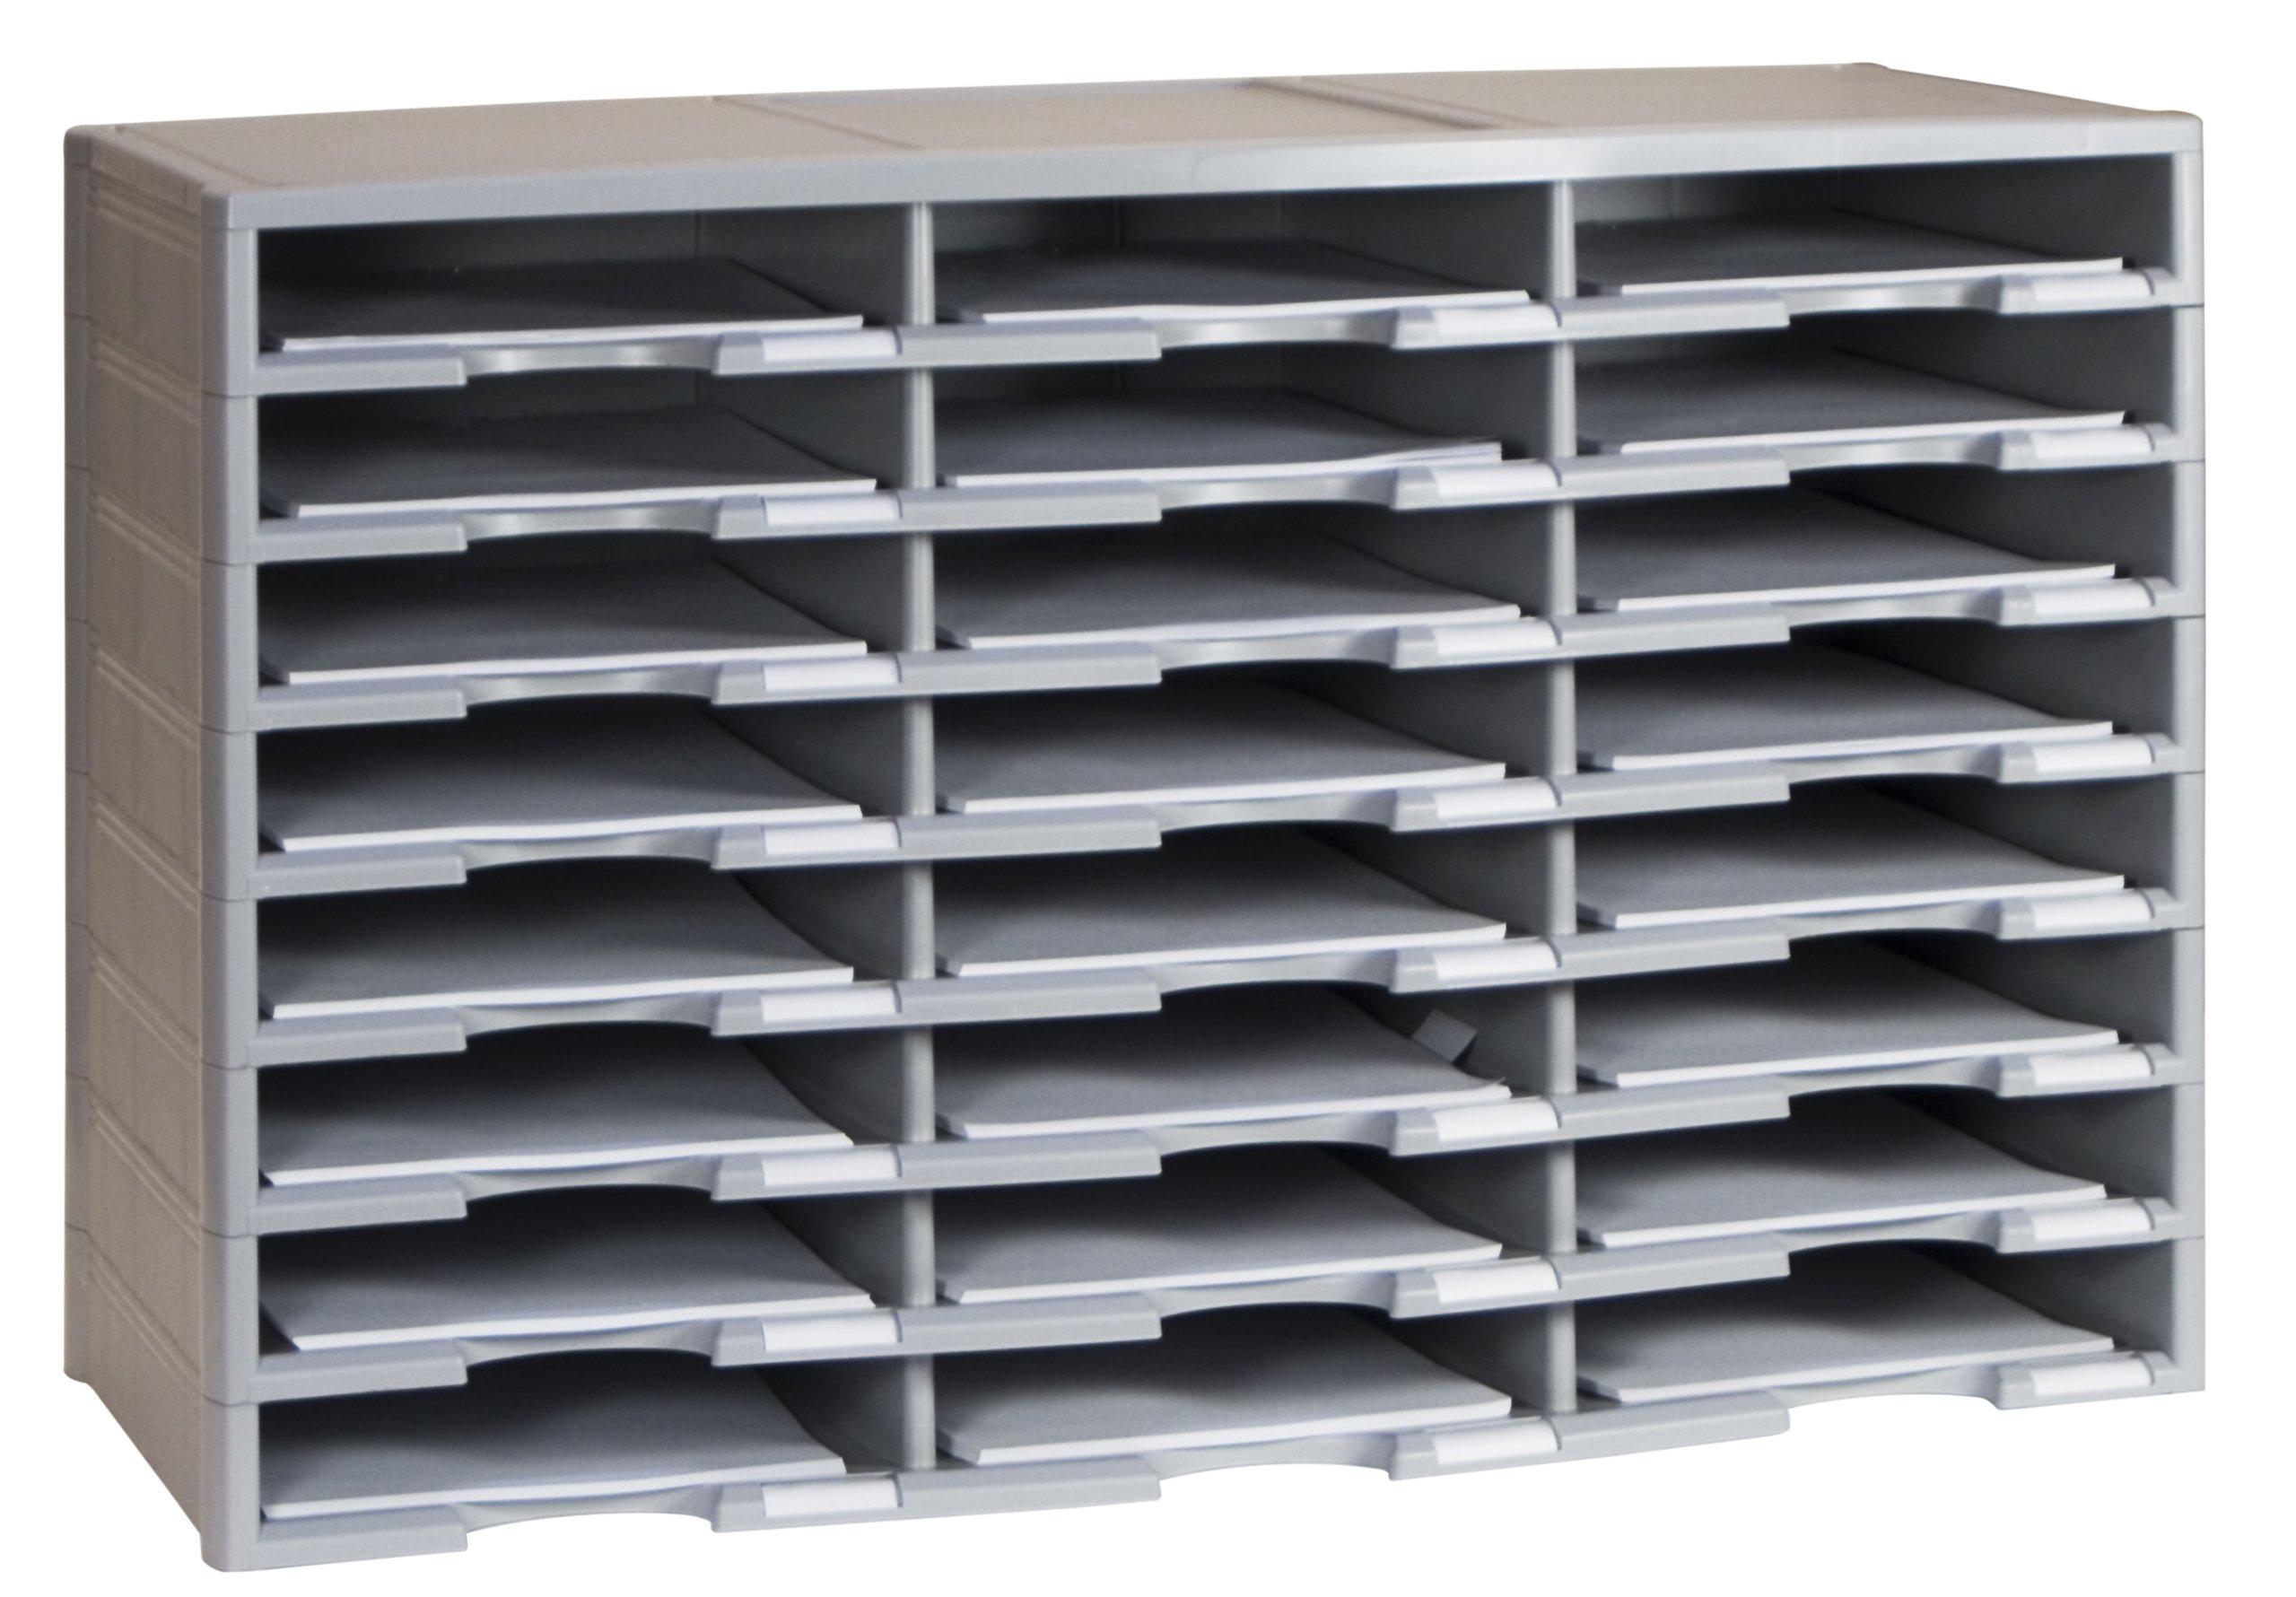 Storex 24-Compartment Literature Organizer, 31.38 x 14.13 x 20.5'', Gray (61434U01C)